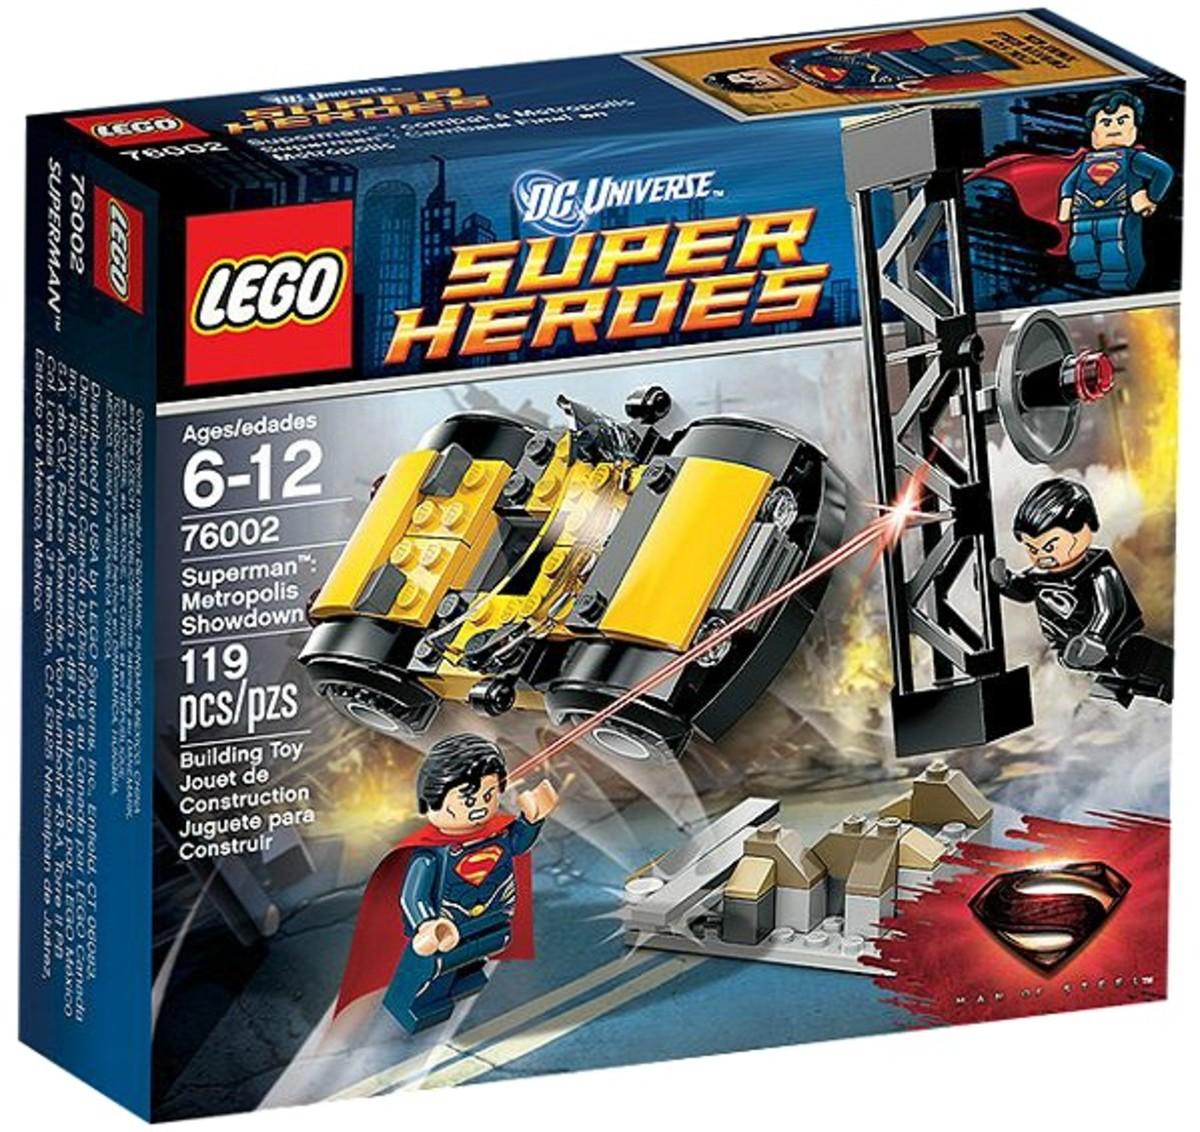 LEGO Super Heroes Superman Metropolis Showdown 76002 Box